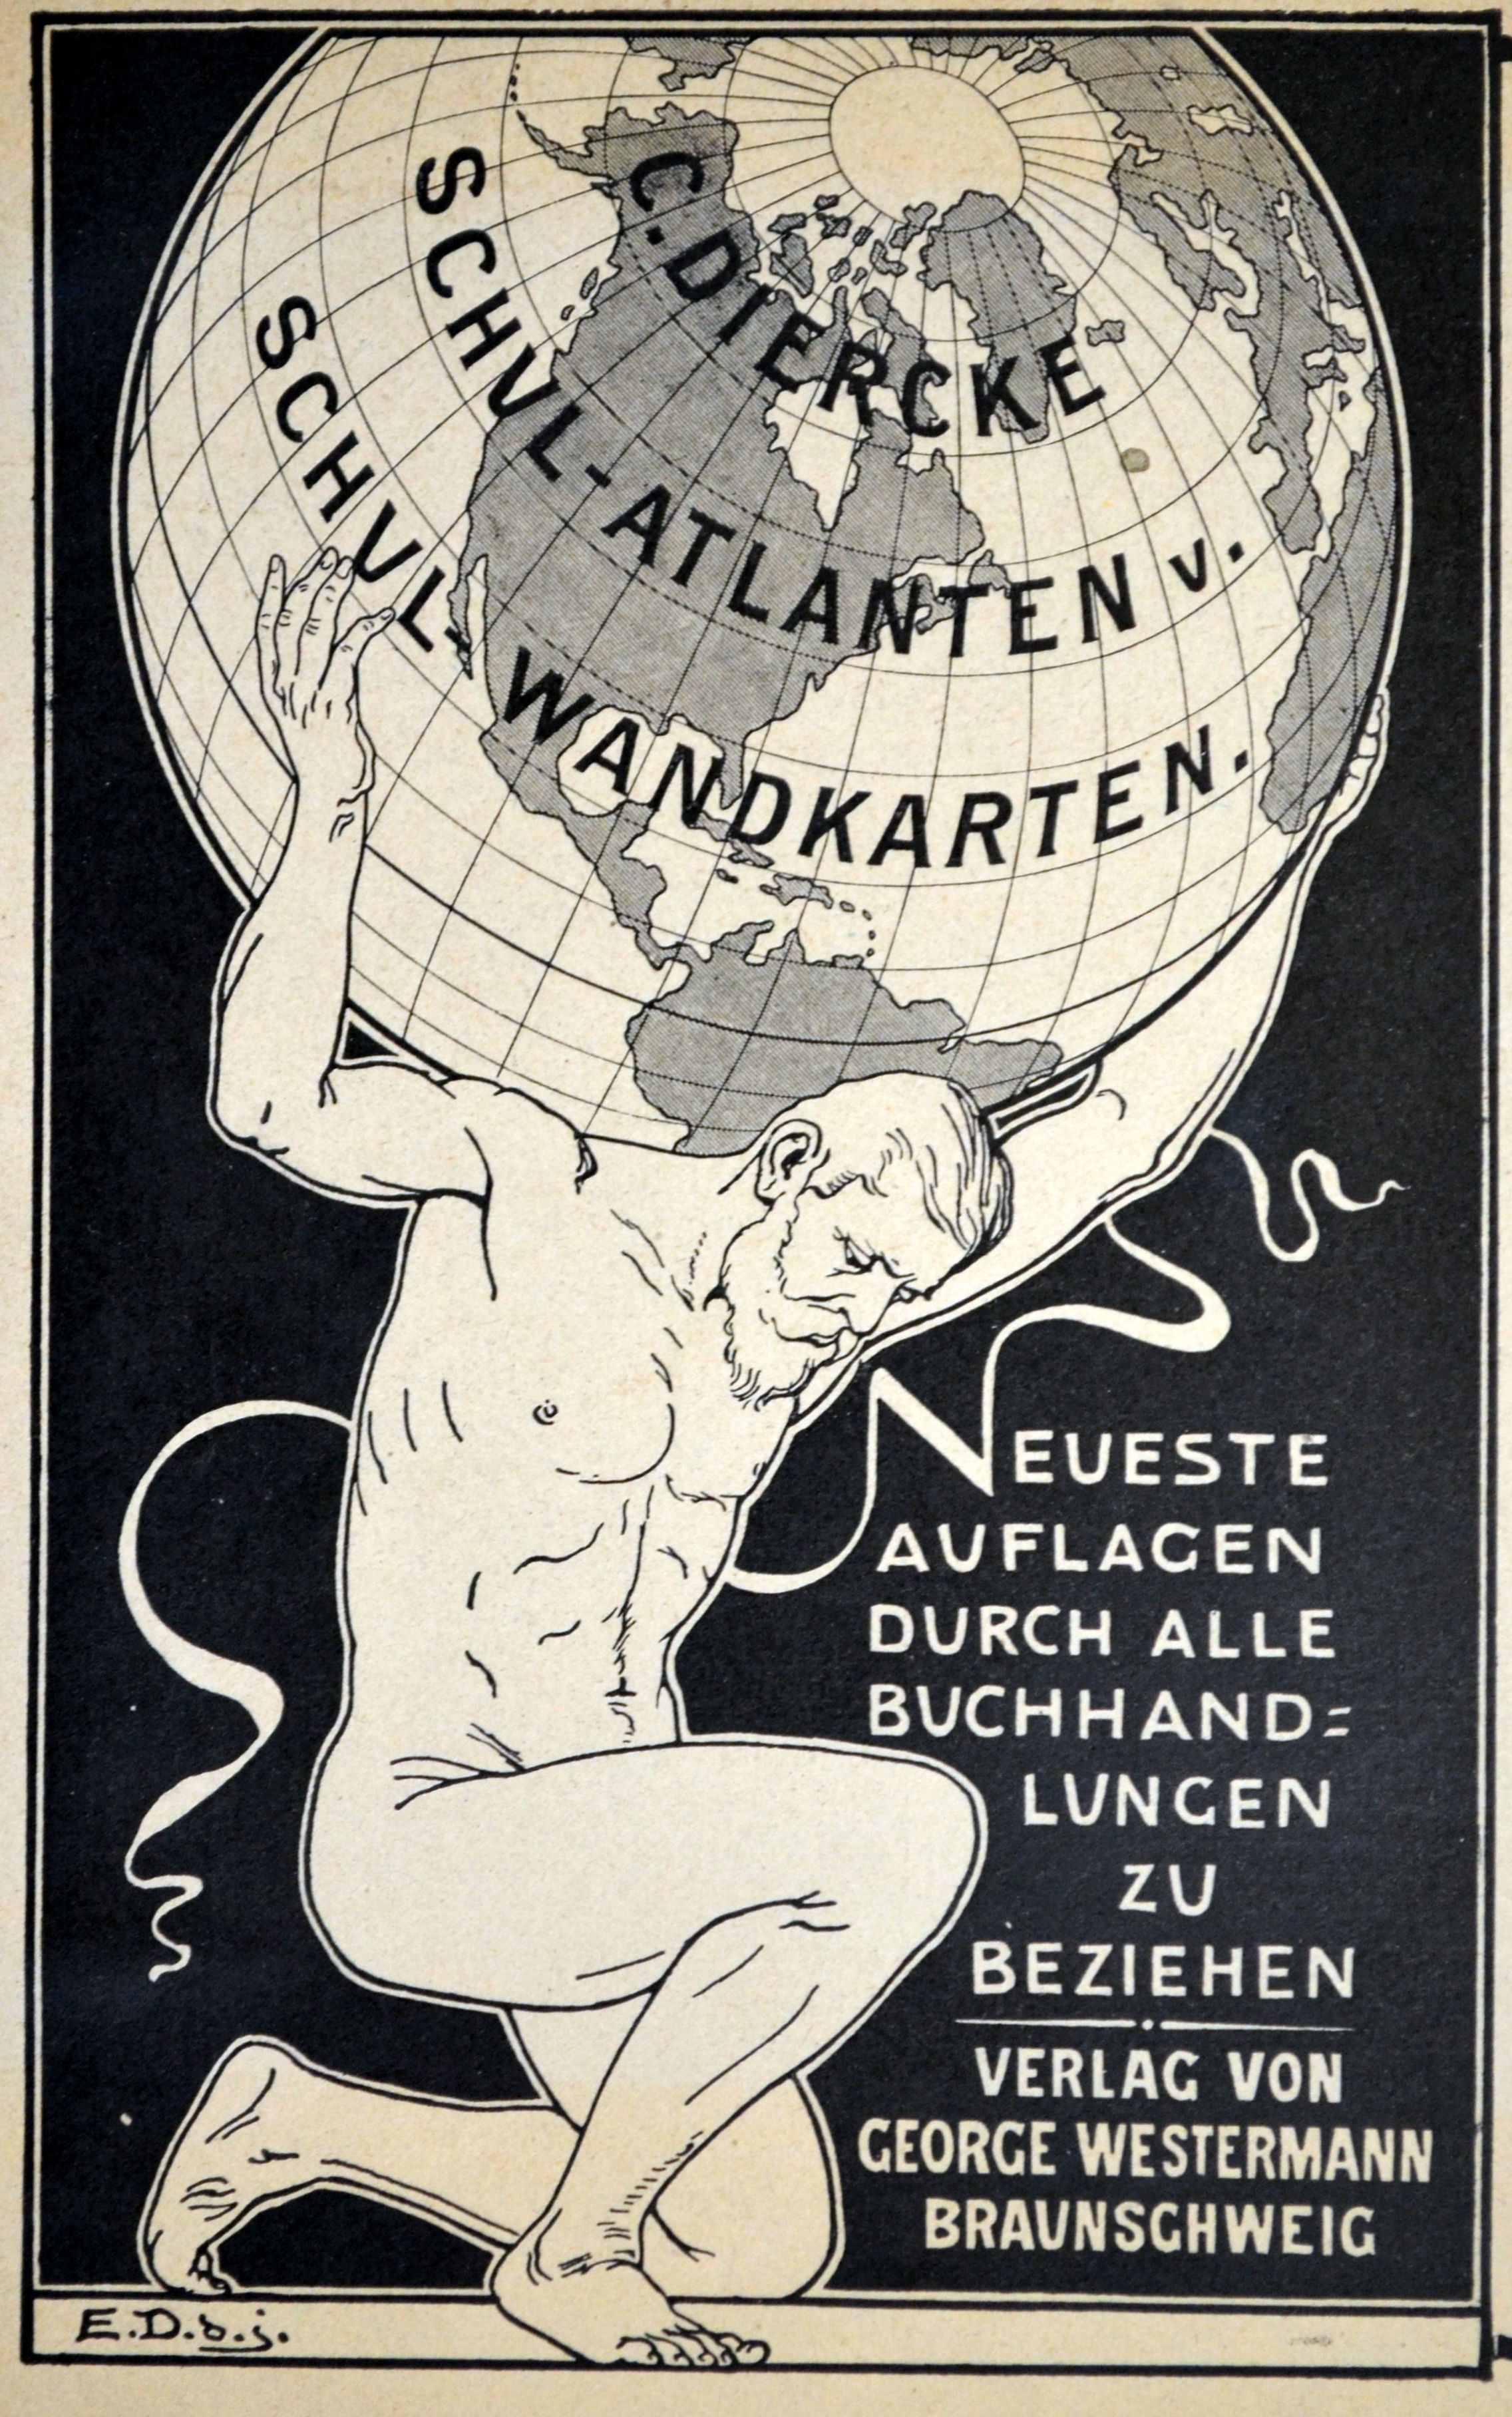 Datei Diercke Schulwandkarten Erster Prospekt 1903 Ua Westermann